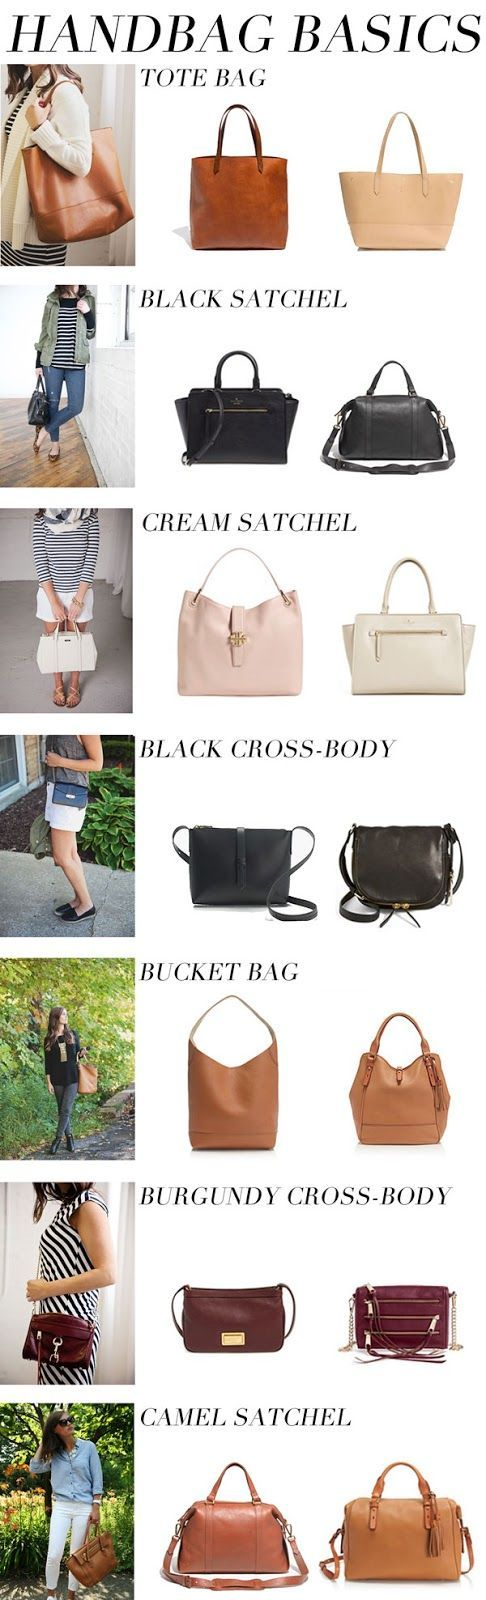 handbag basics...   The Good Life For Less   Bloglovin'